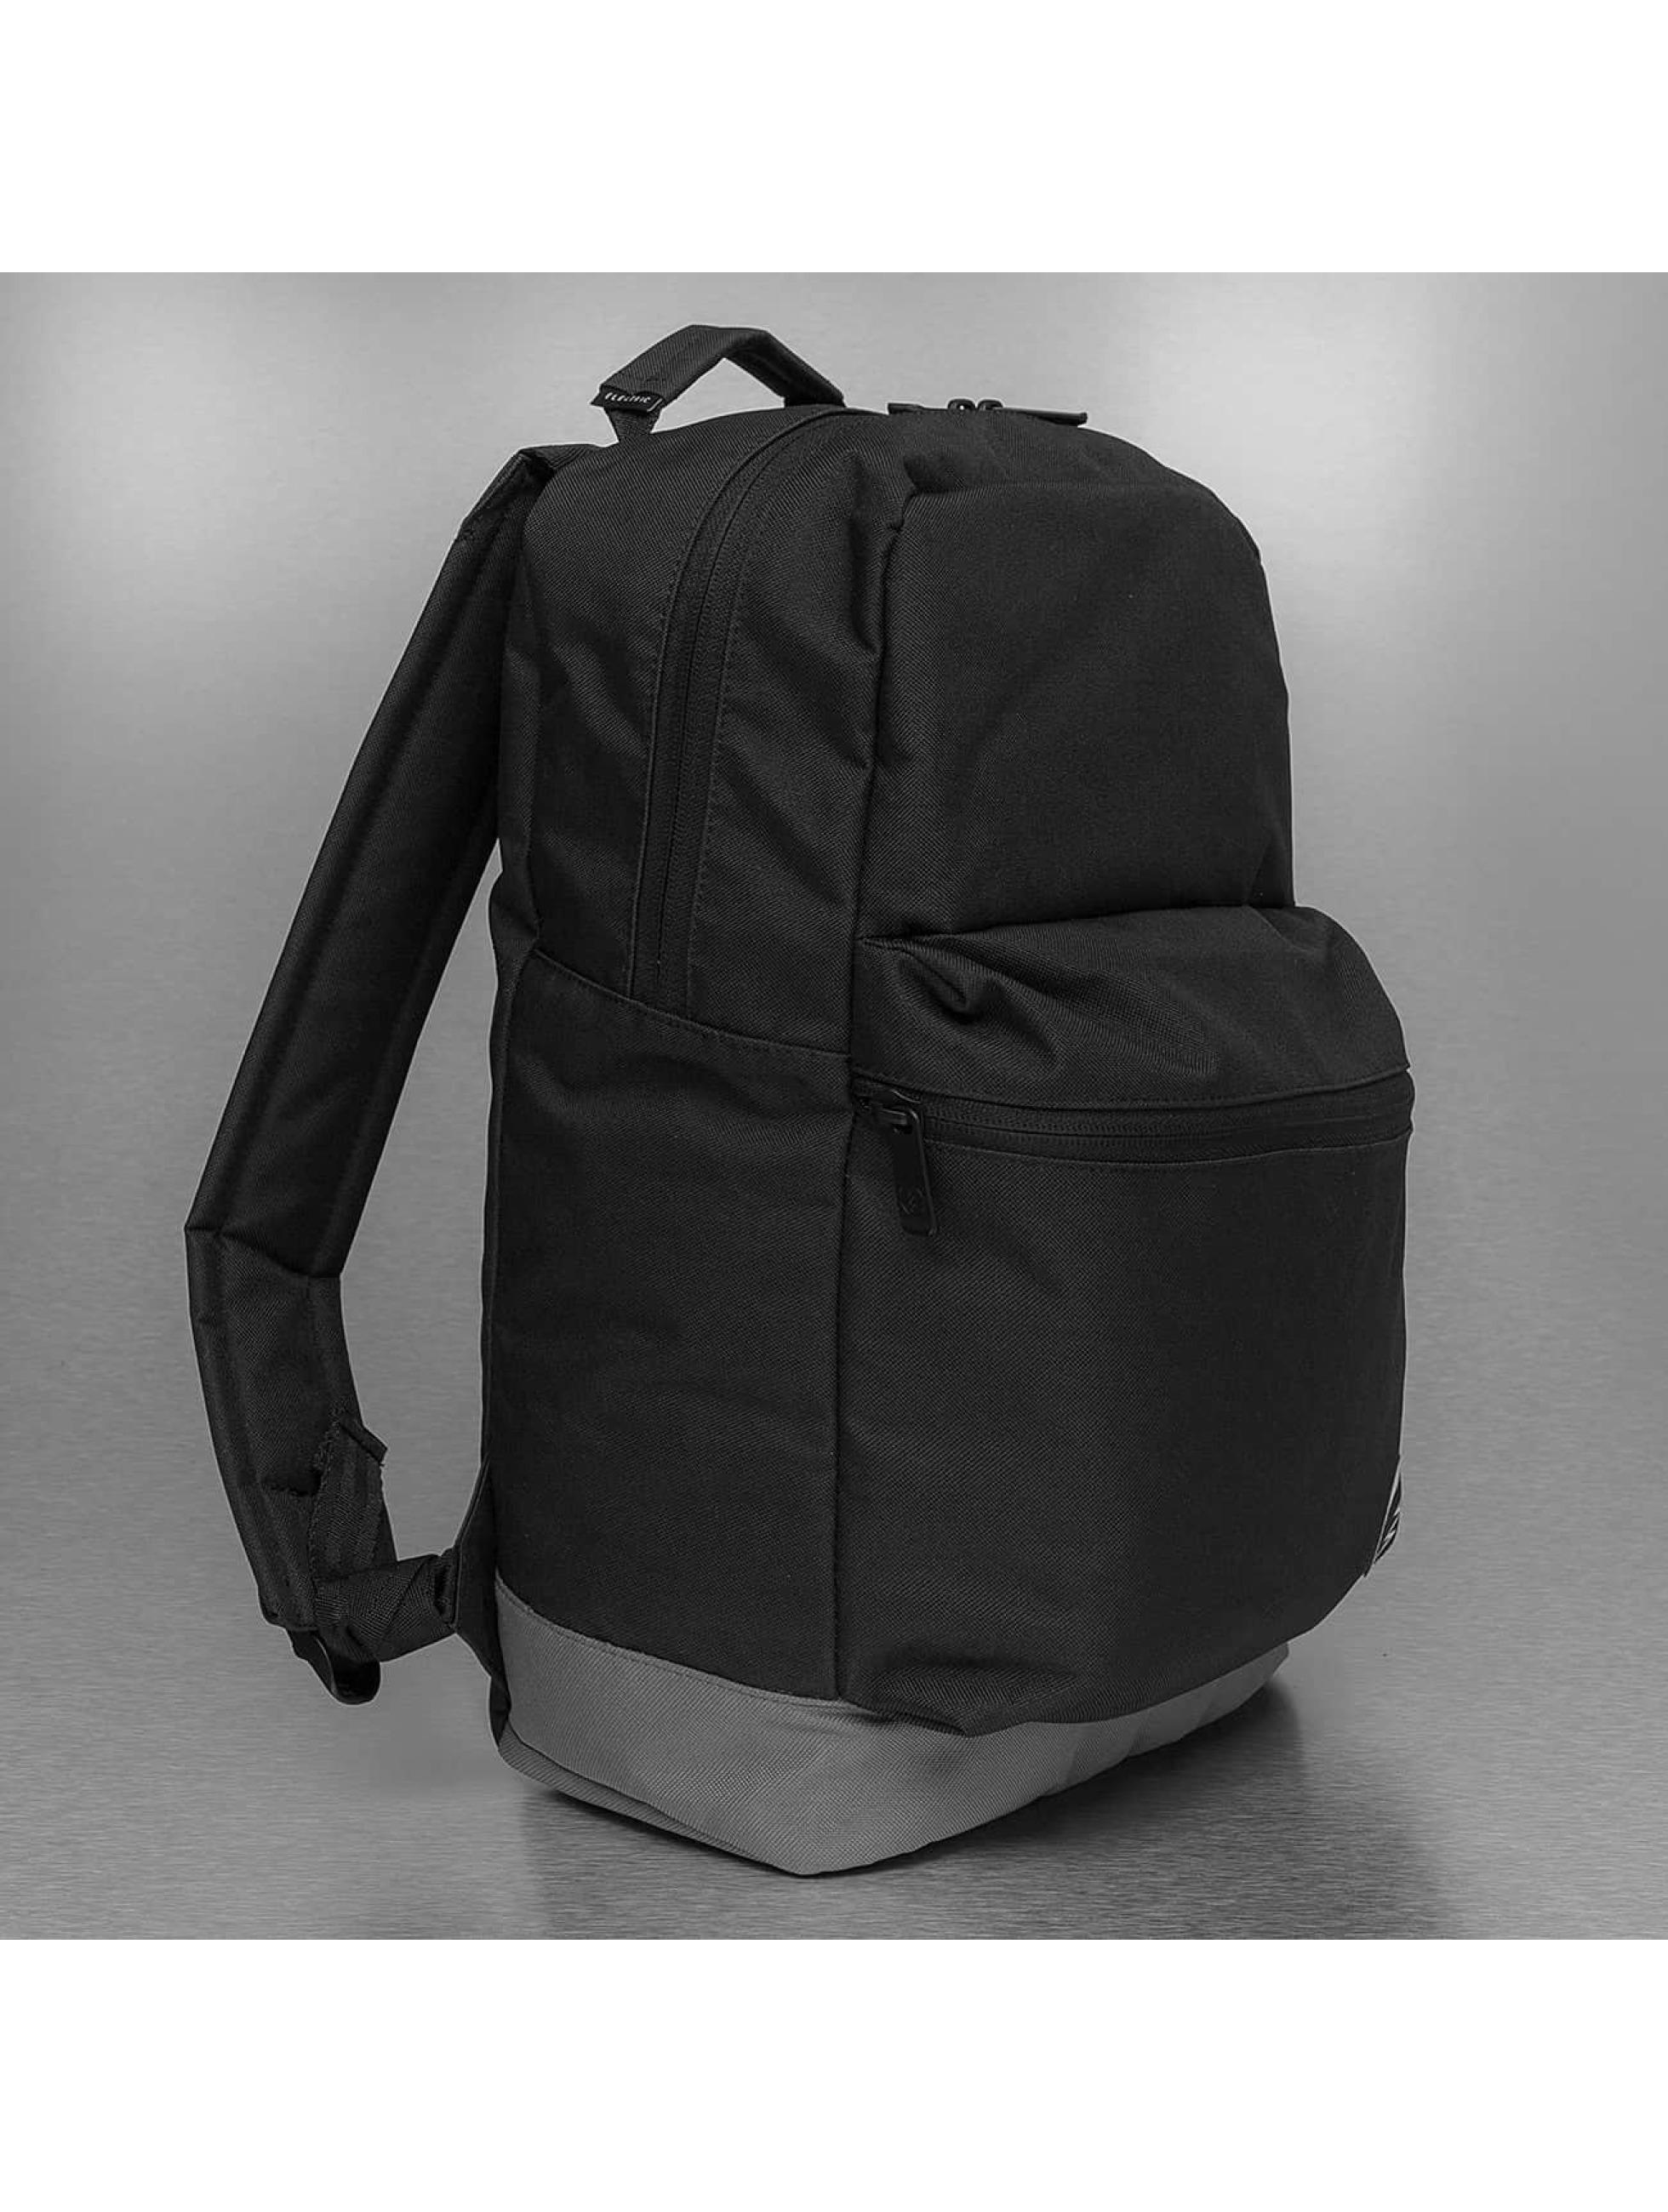 Electric Рюкзак MARSHAL черный